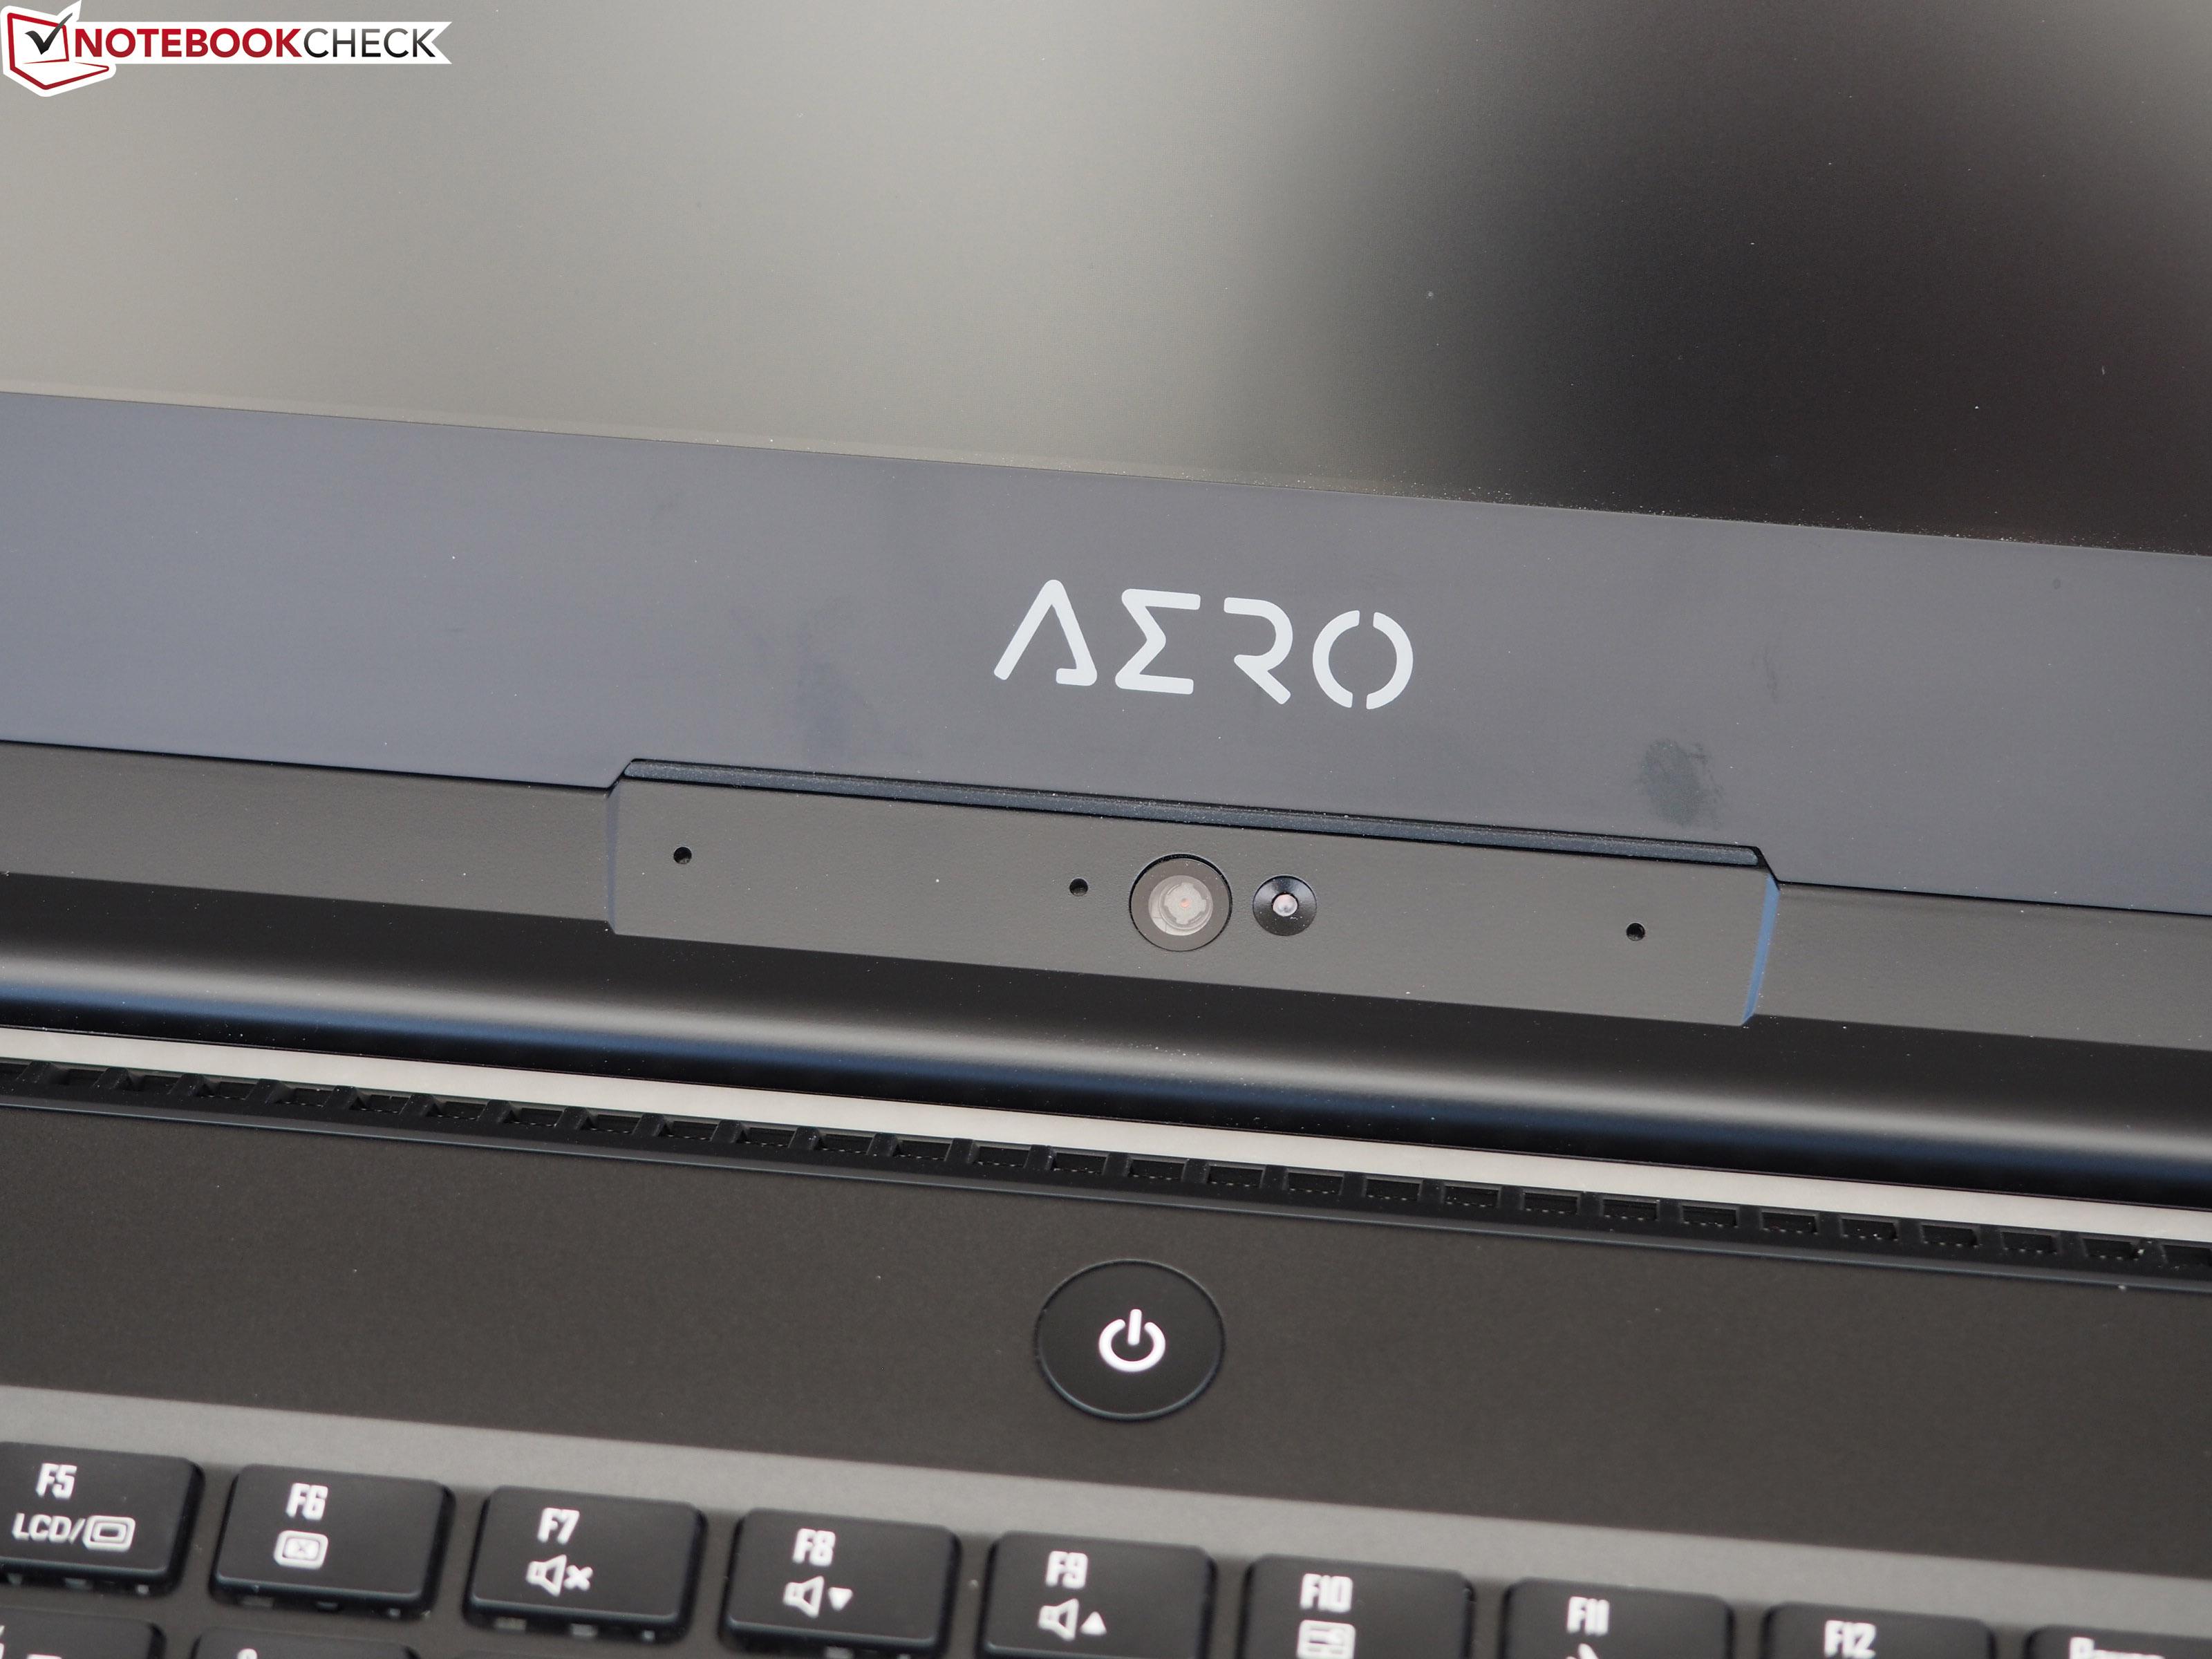 Gigabyte Aero 15X v8 (i7-8750H, GTX 1070 Max-Q, Full-HD) Laptop